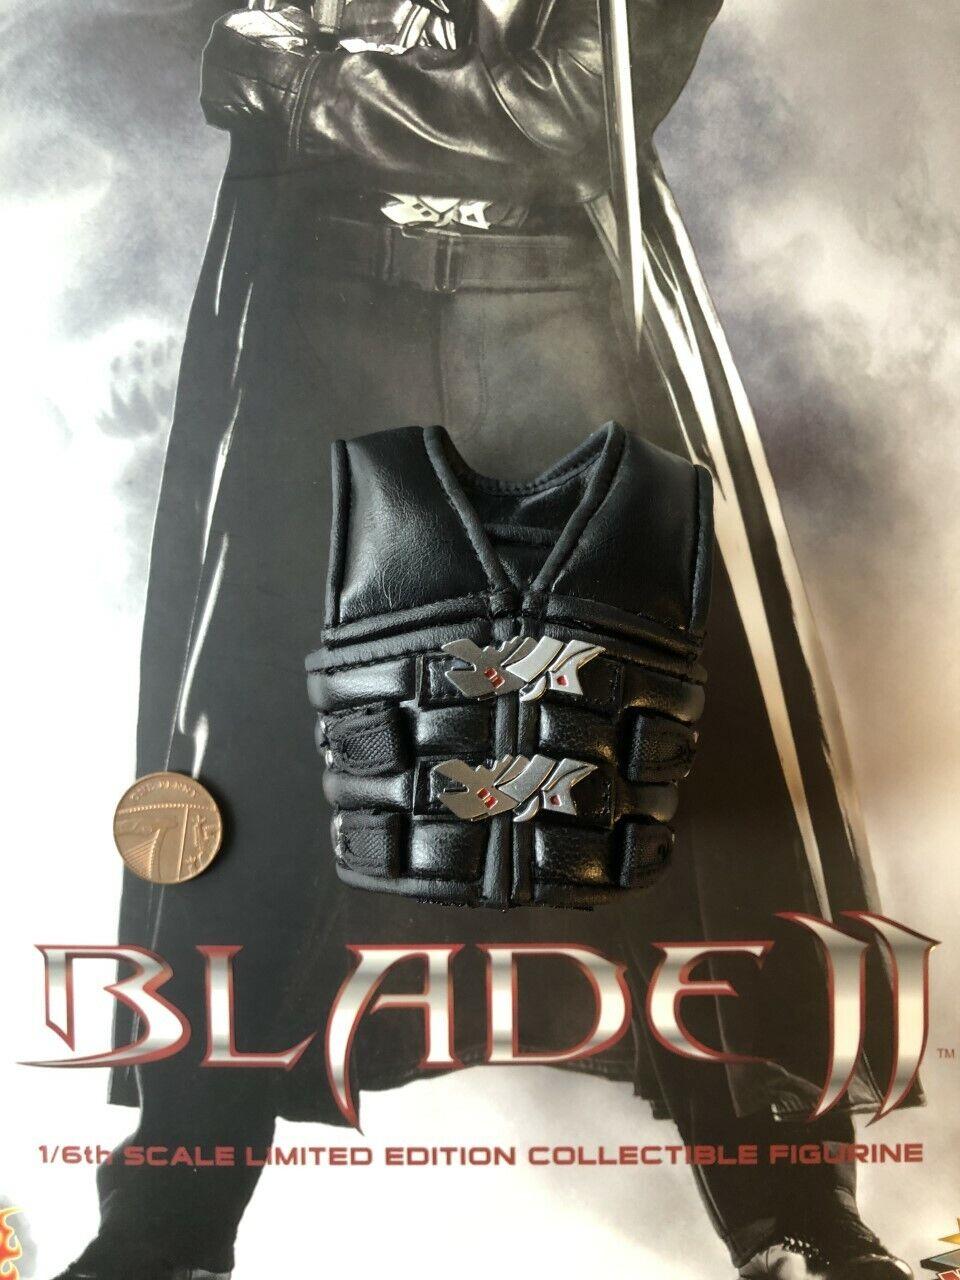 II Lama caliente giocattoli Lama MMS113 nera in pelle Gilet  Loose SCALA 1 6th  negozio all'ingrosso